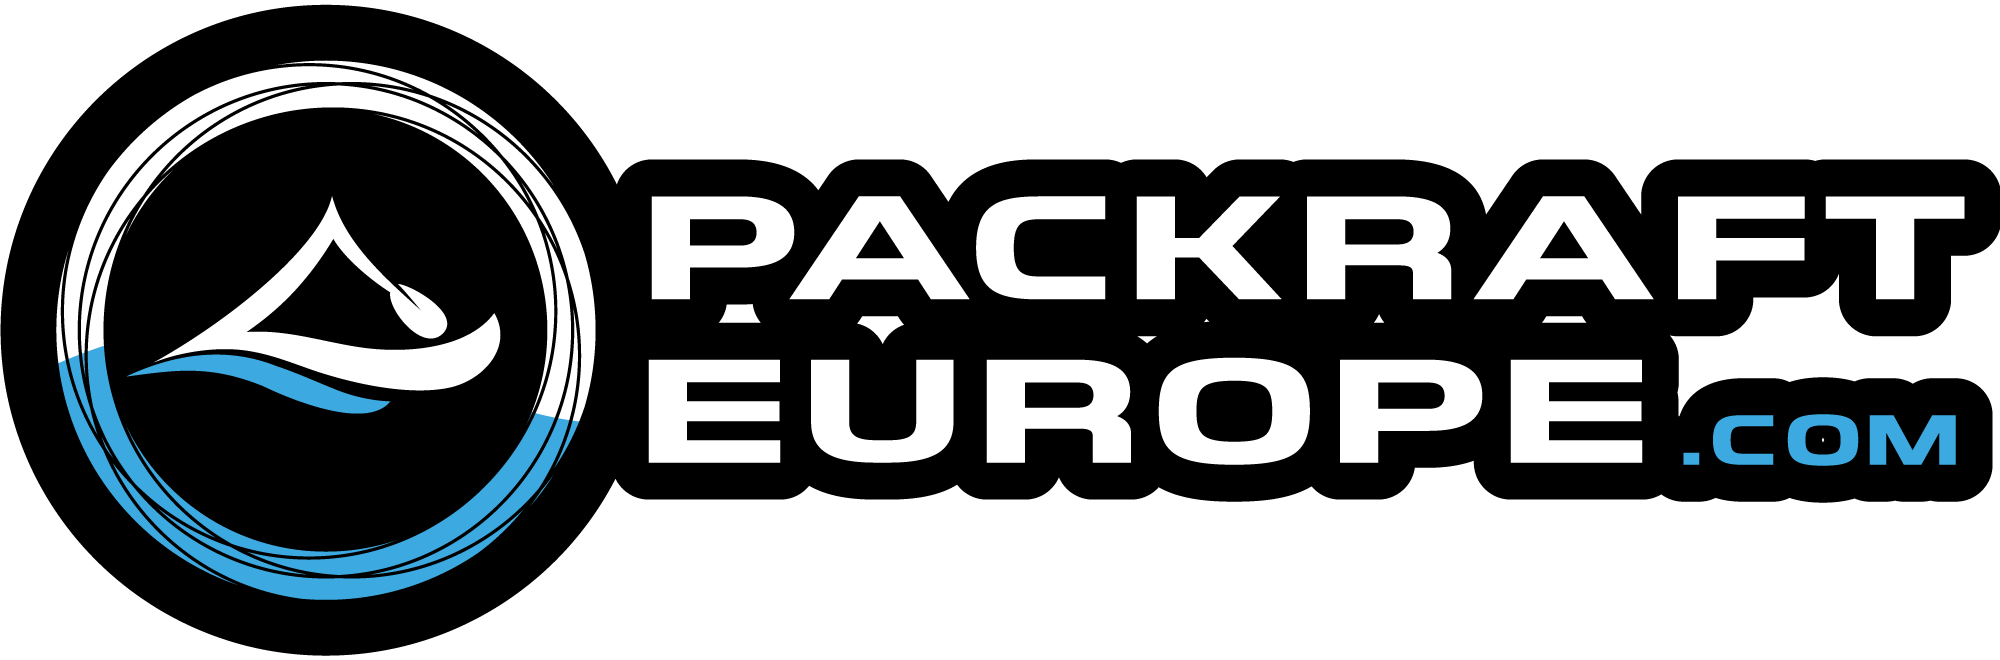 Packraft Europe